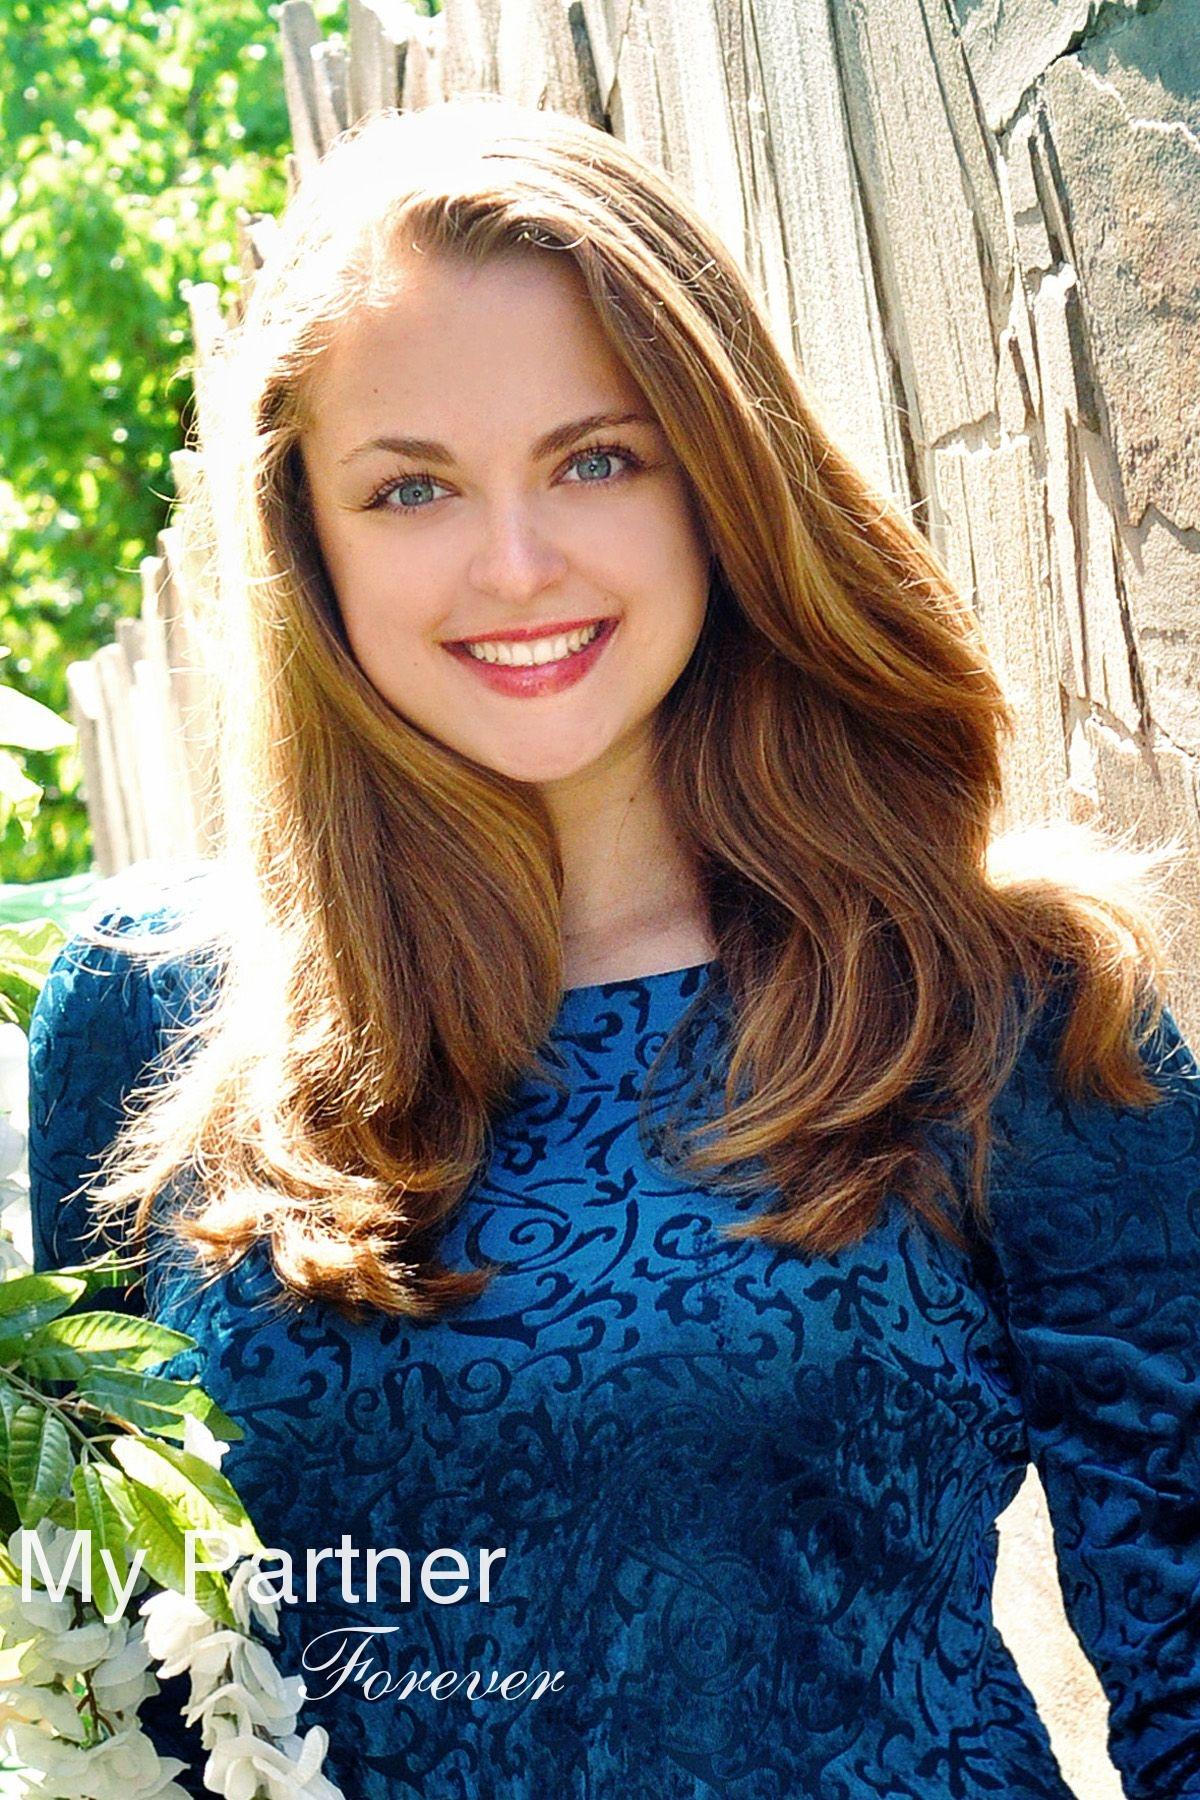 Meet Beautiful Ukrainian Lady Ekaterina from Kharkov, Ukraine